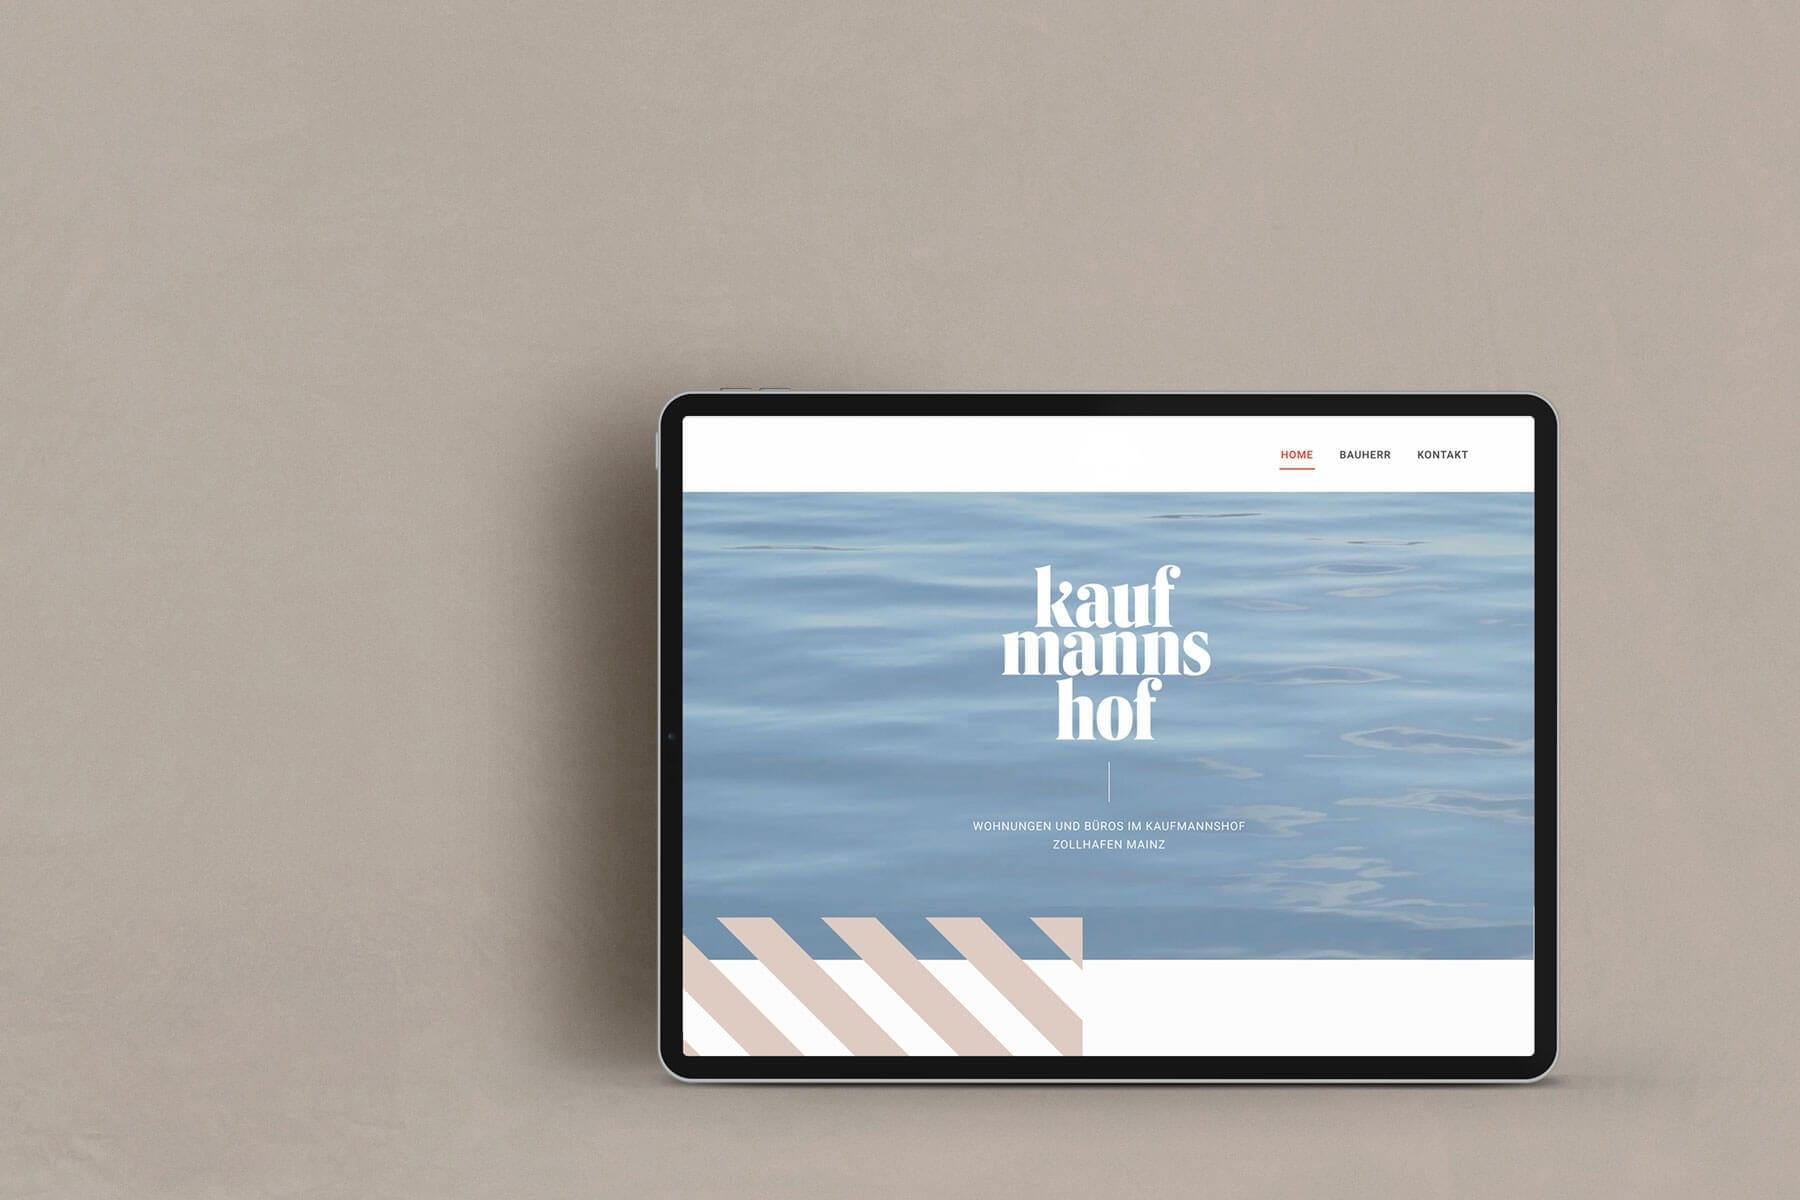 Website Kaufmannshof auf iPad